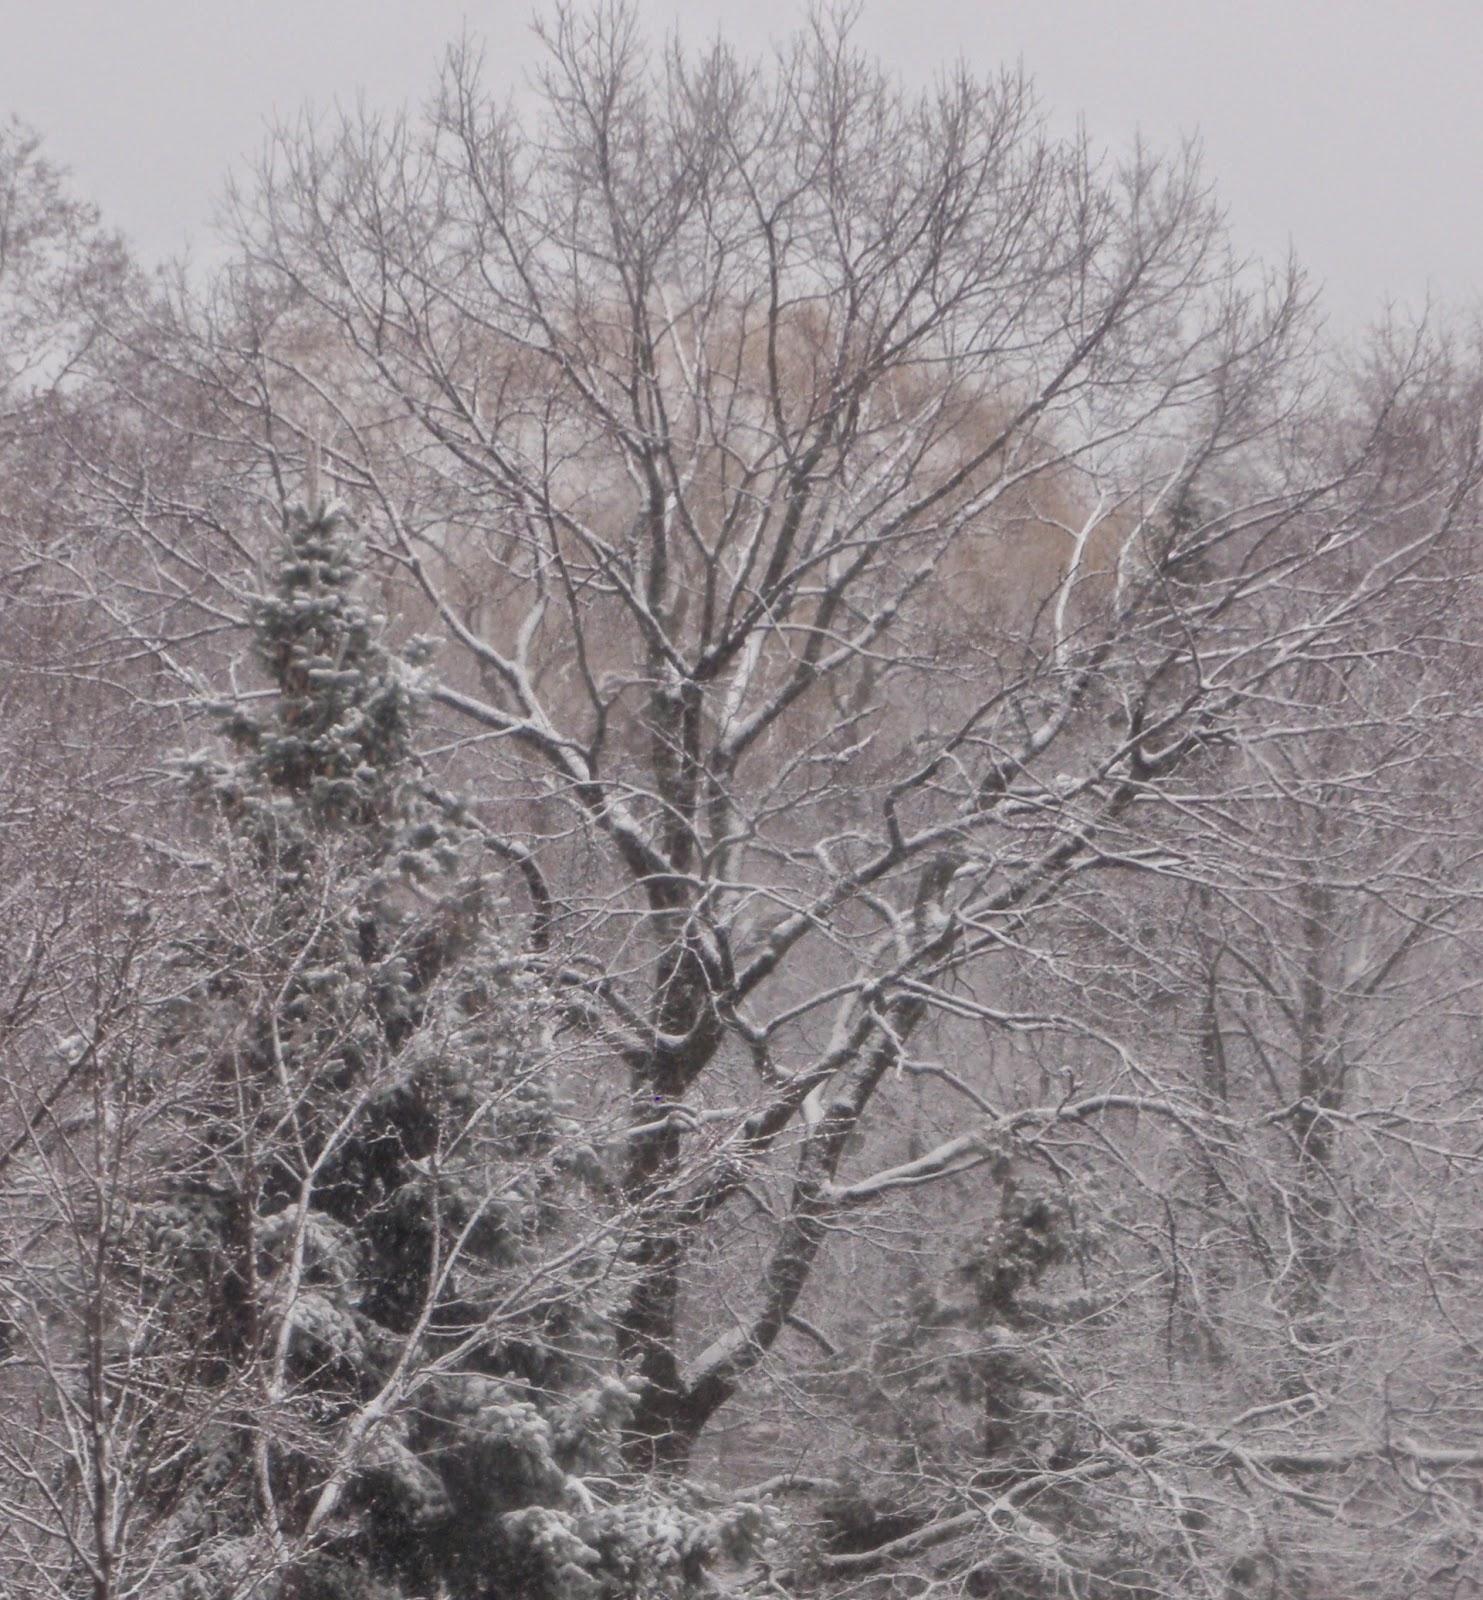 Spring snow, April 15 2014.